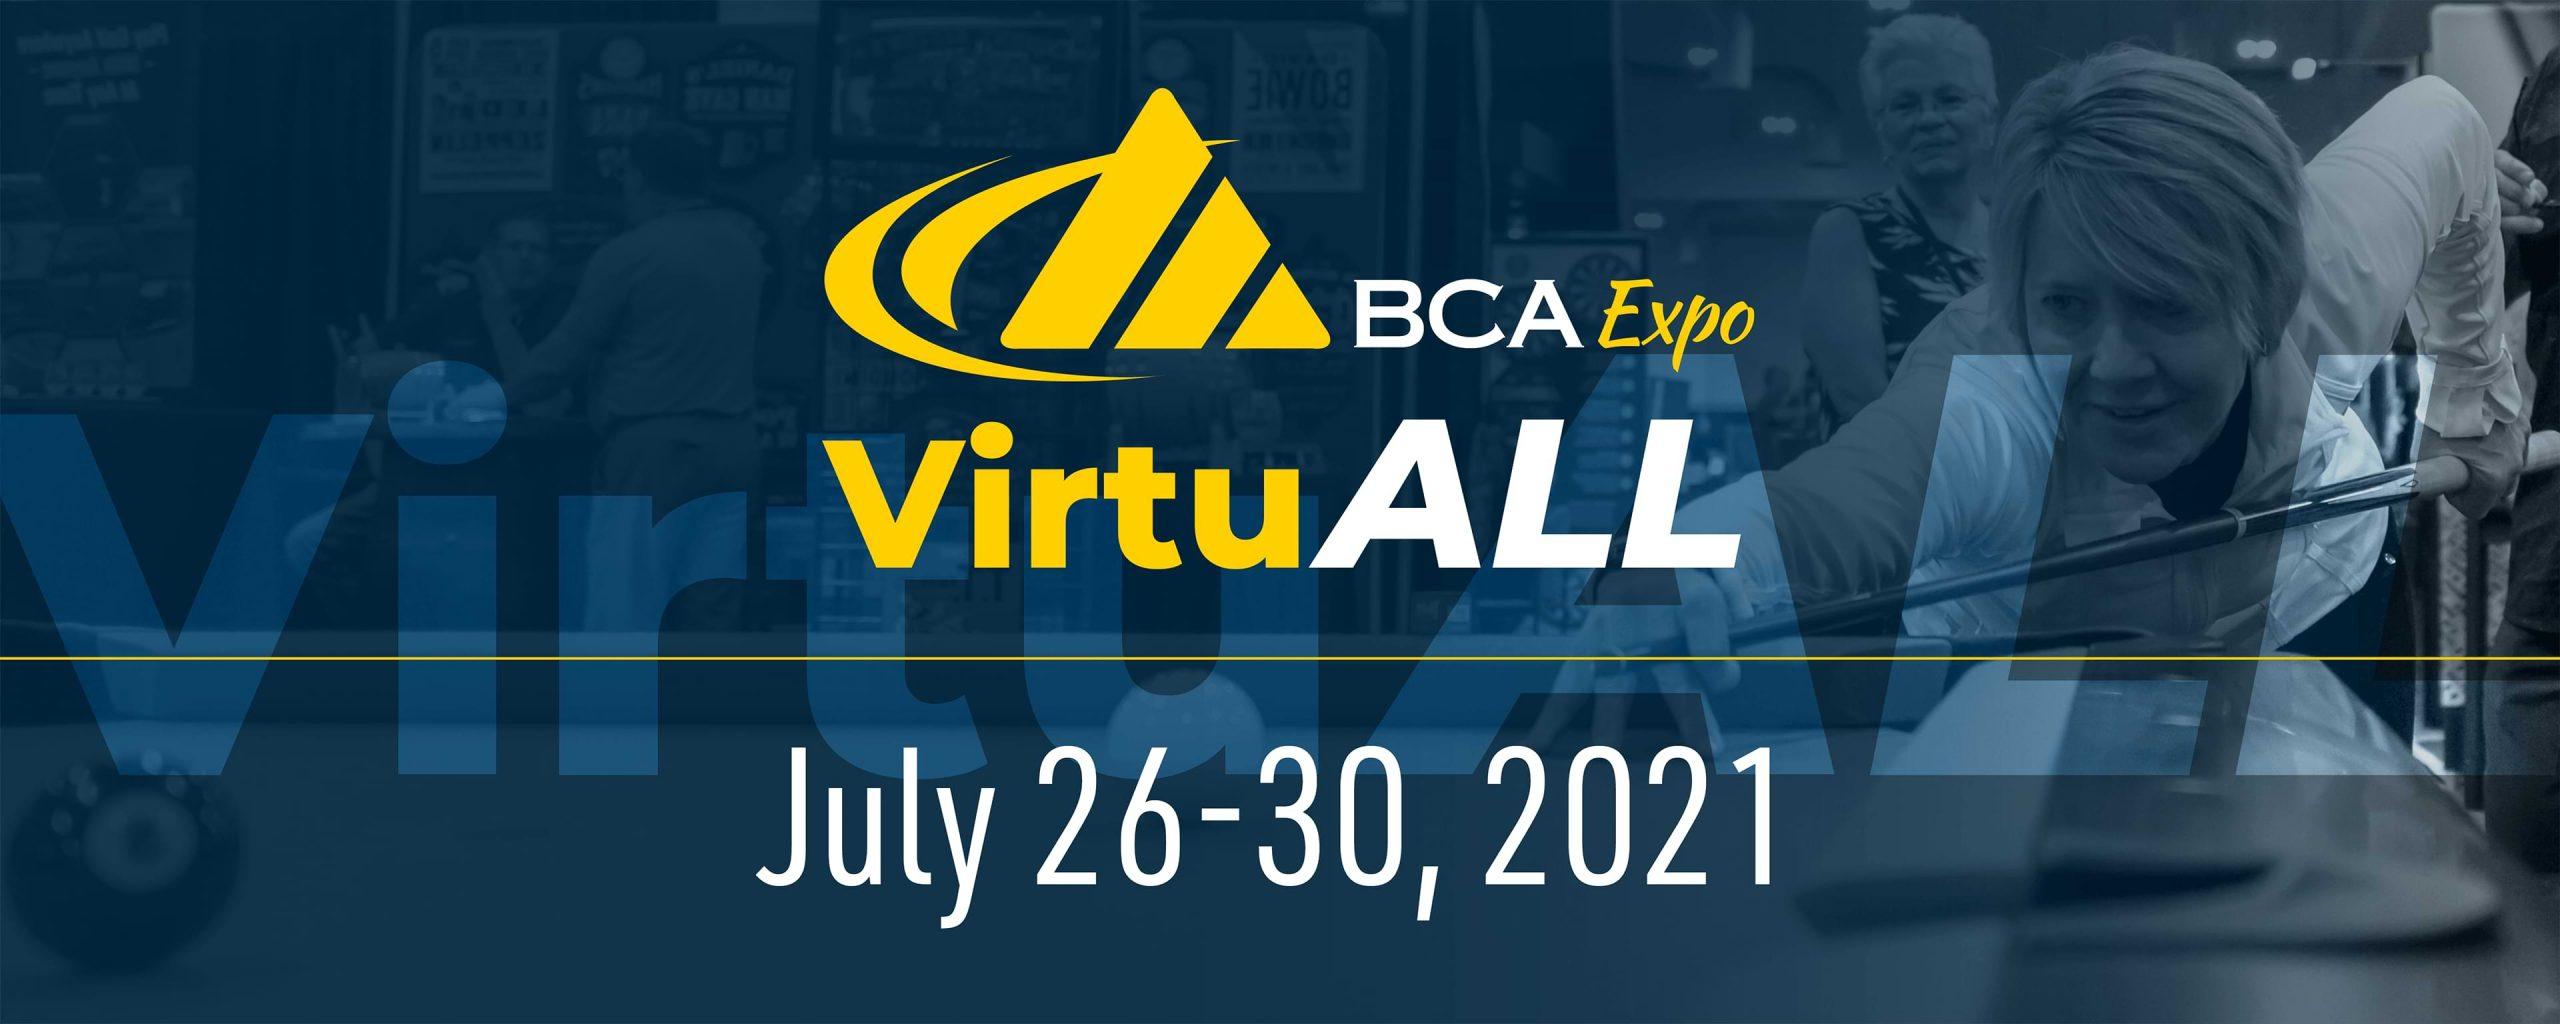 BCA VirtuALL July 26-40, 2021